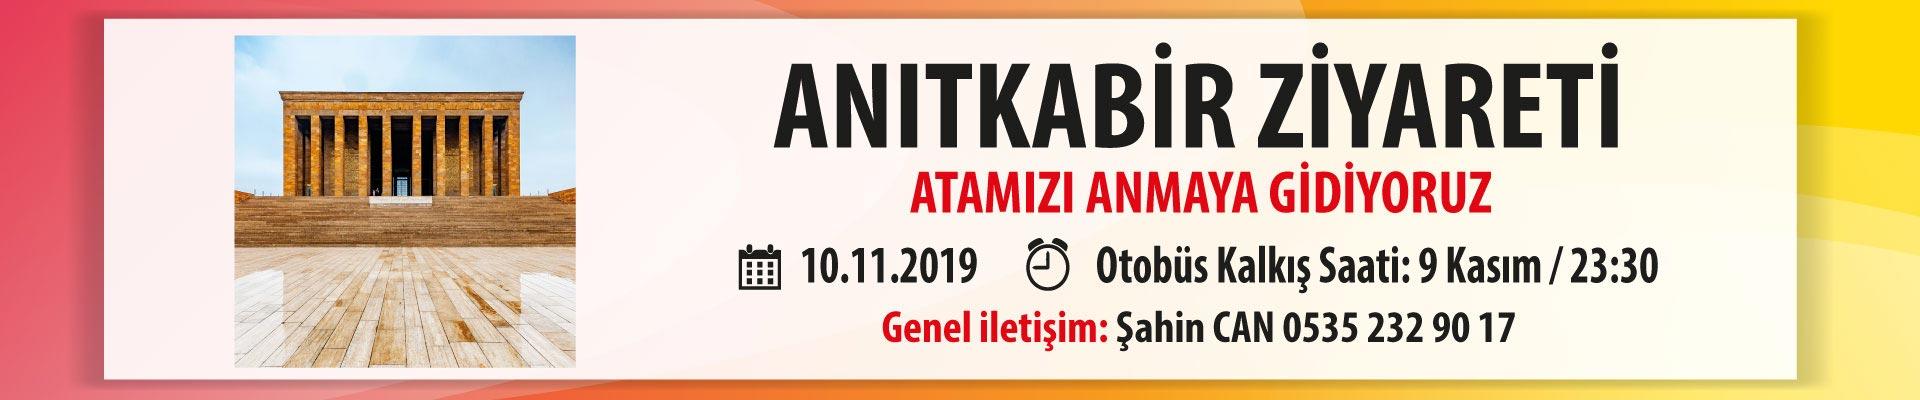 anitkabir-ziyareti-1920-400